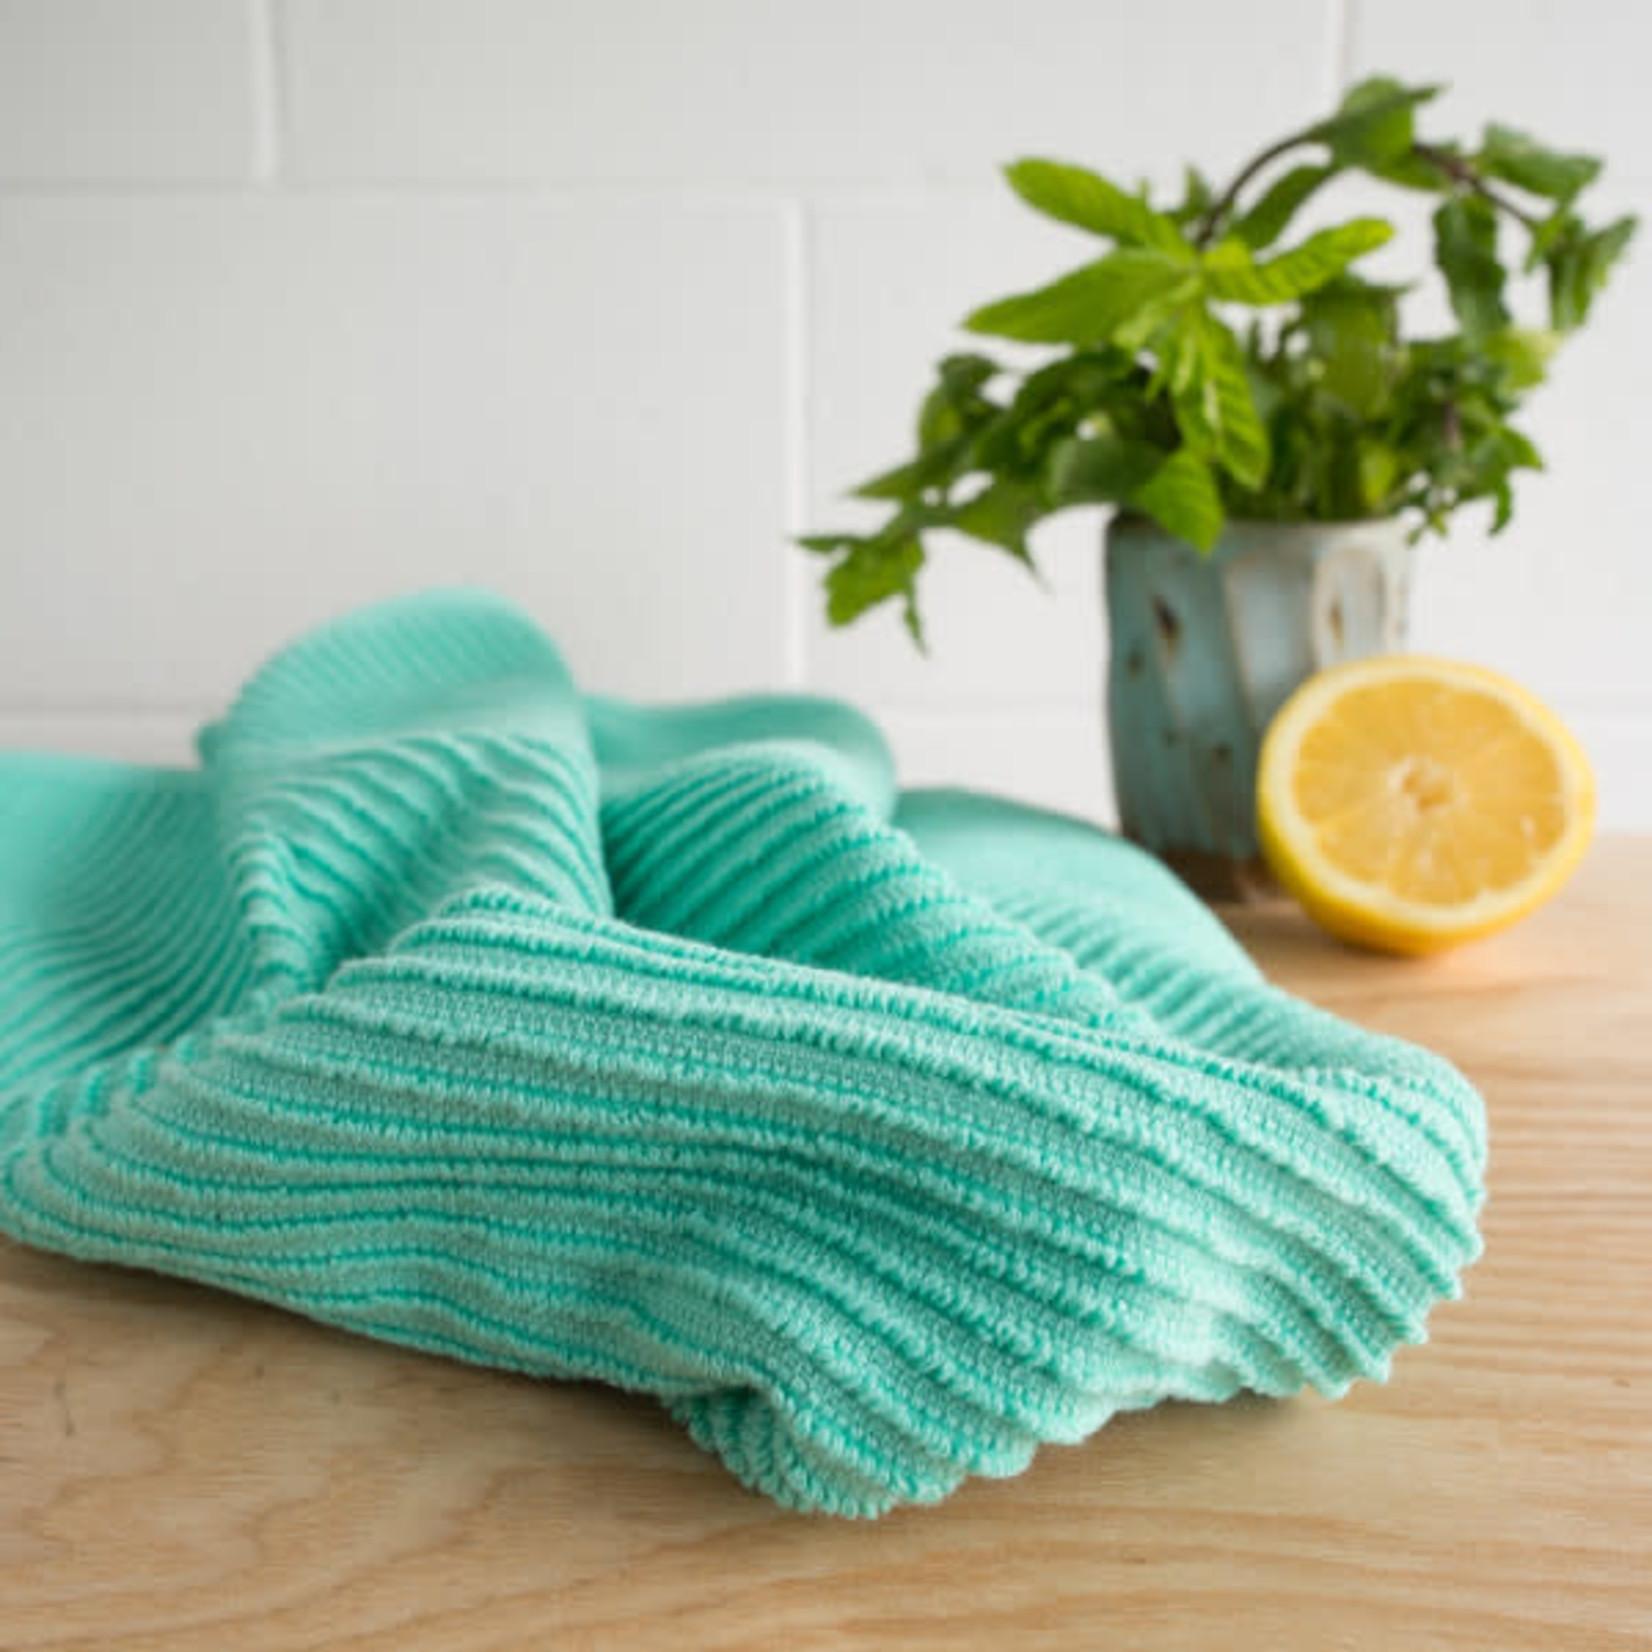 Ripple Lucite Green Tea Towel